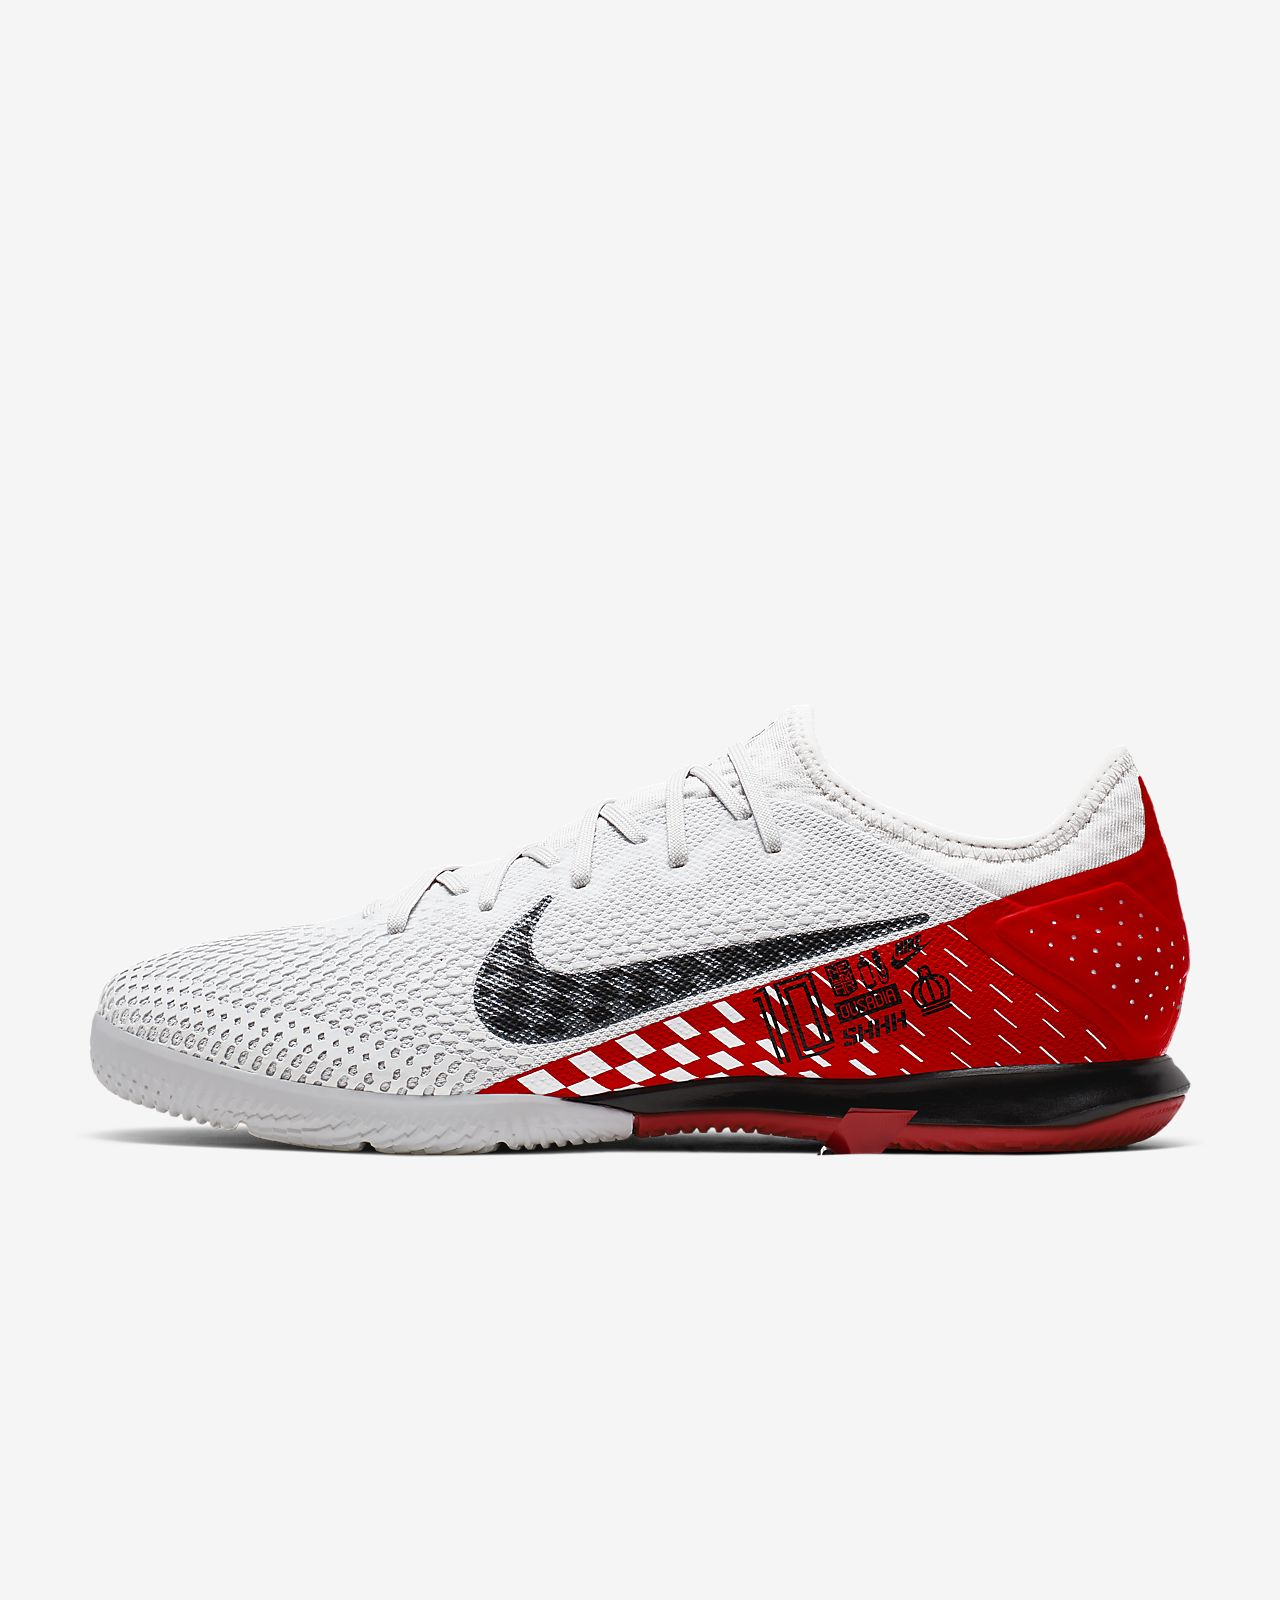 Nike fußballschuhe halle mit socken, nike air max thea mid